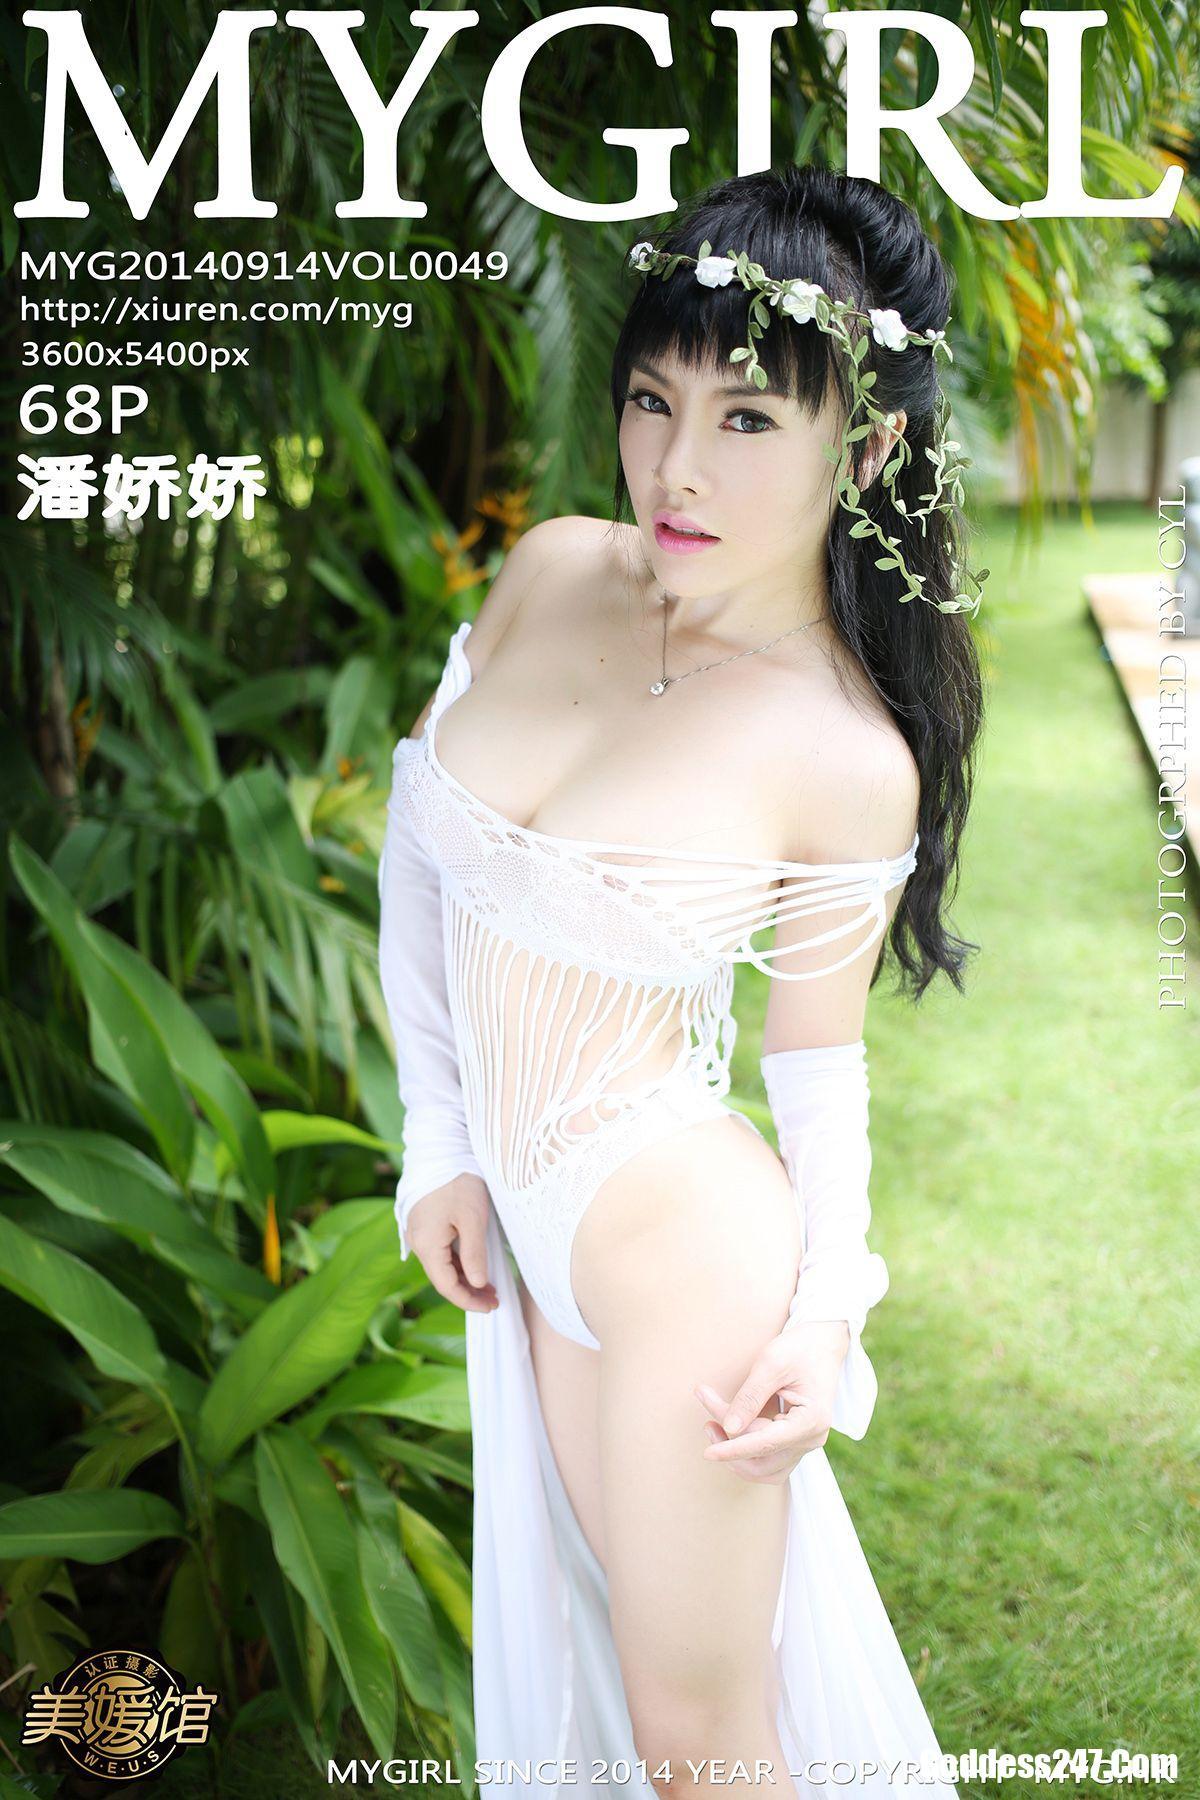 MyGirl Vol.049 潘娇娇